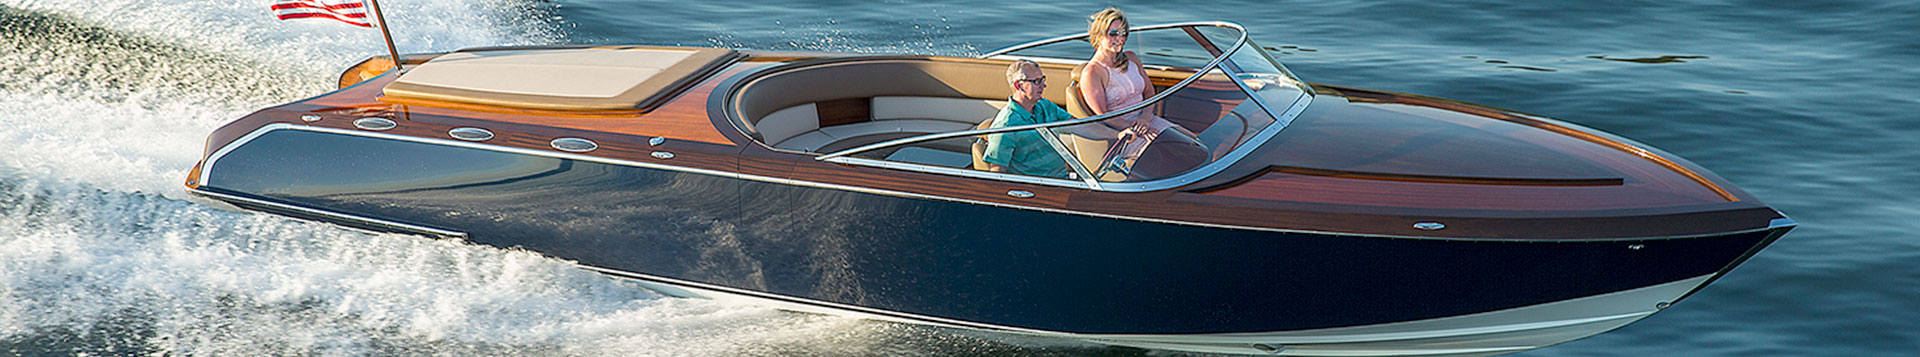 Coeur Customs, Pure 340, Custom Wood Boat